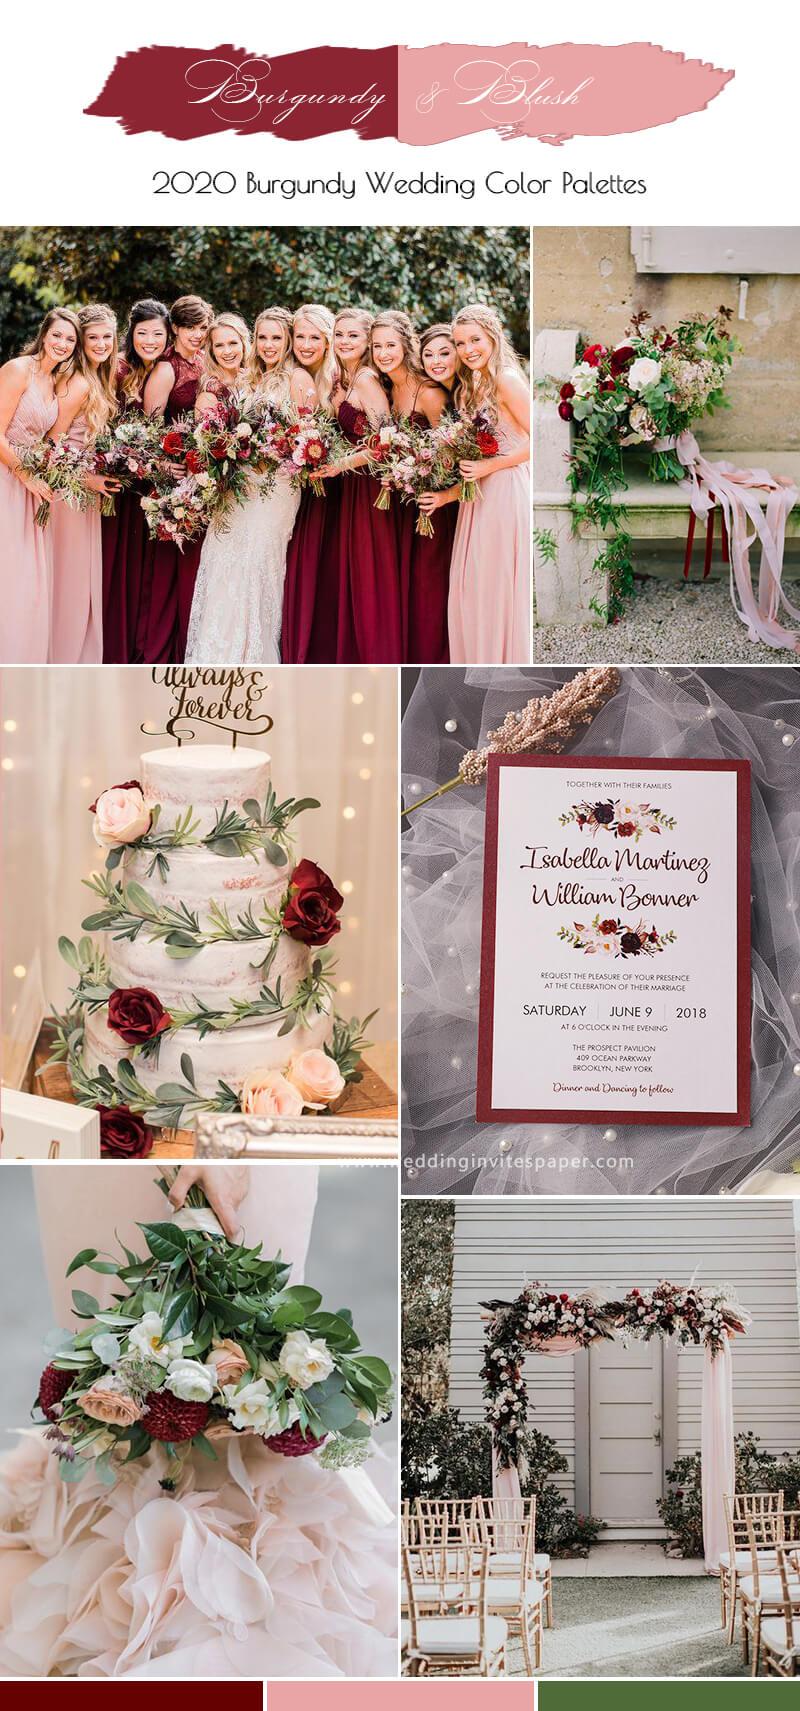 burgundy and blush wedding colors palettes Wedding